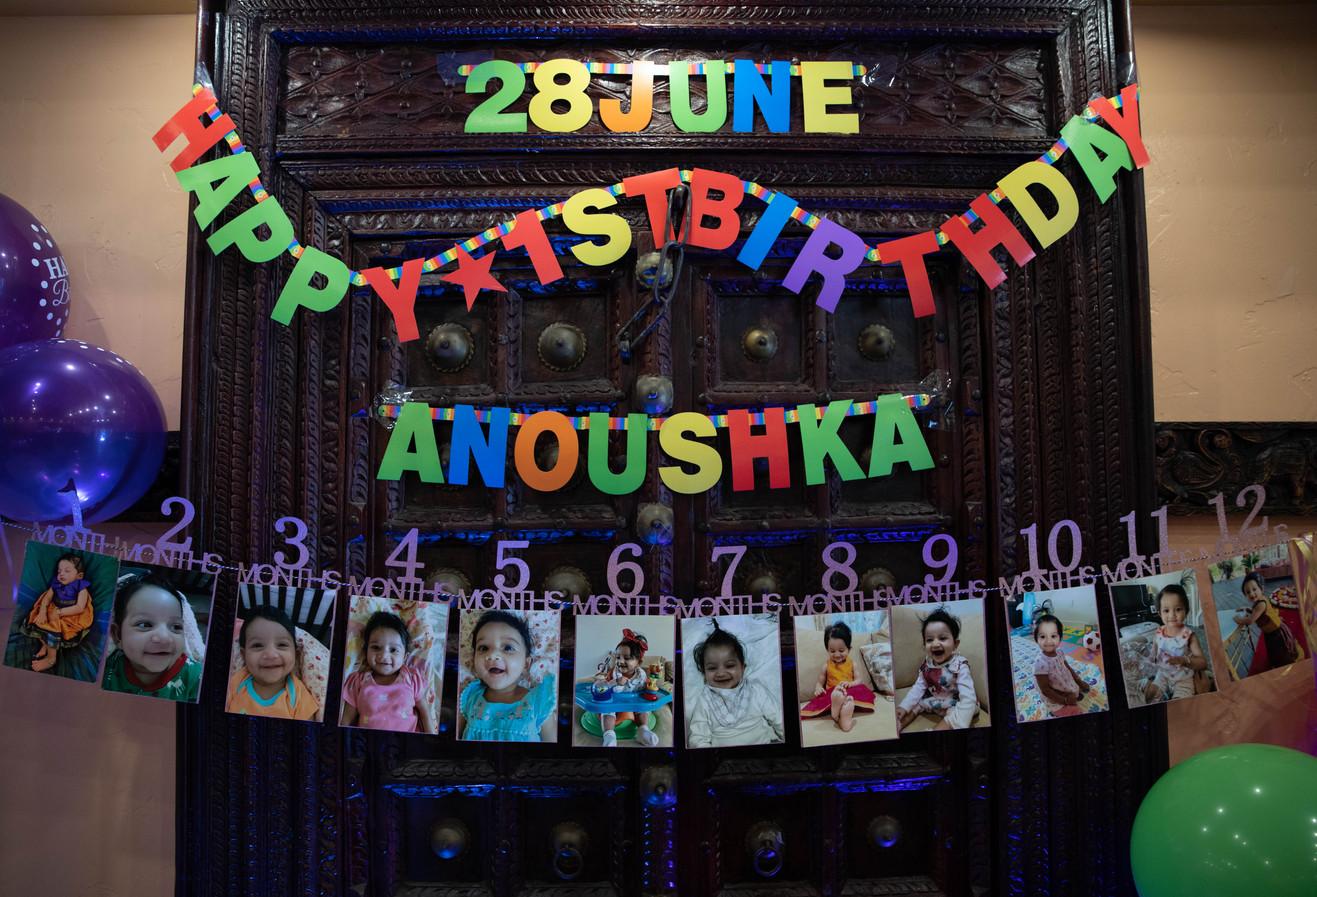 Anoushka-1551